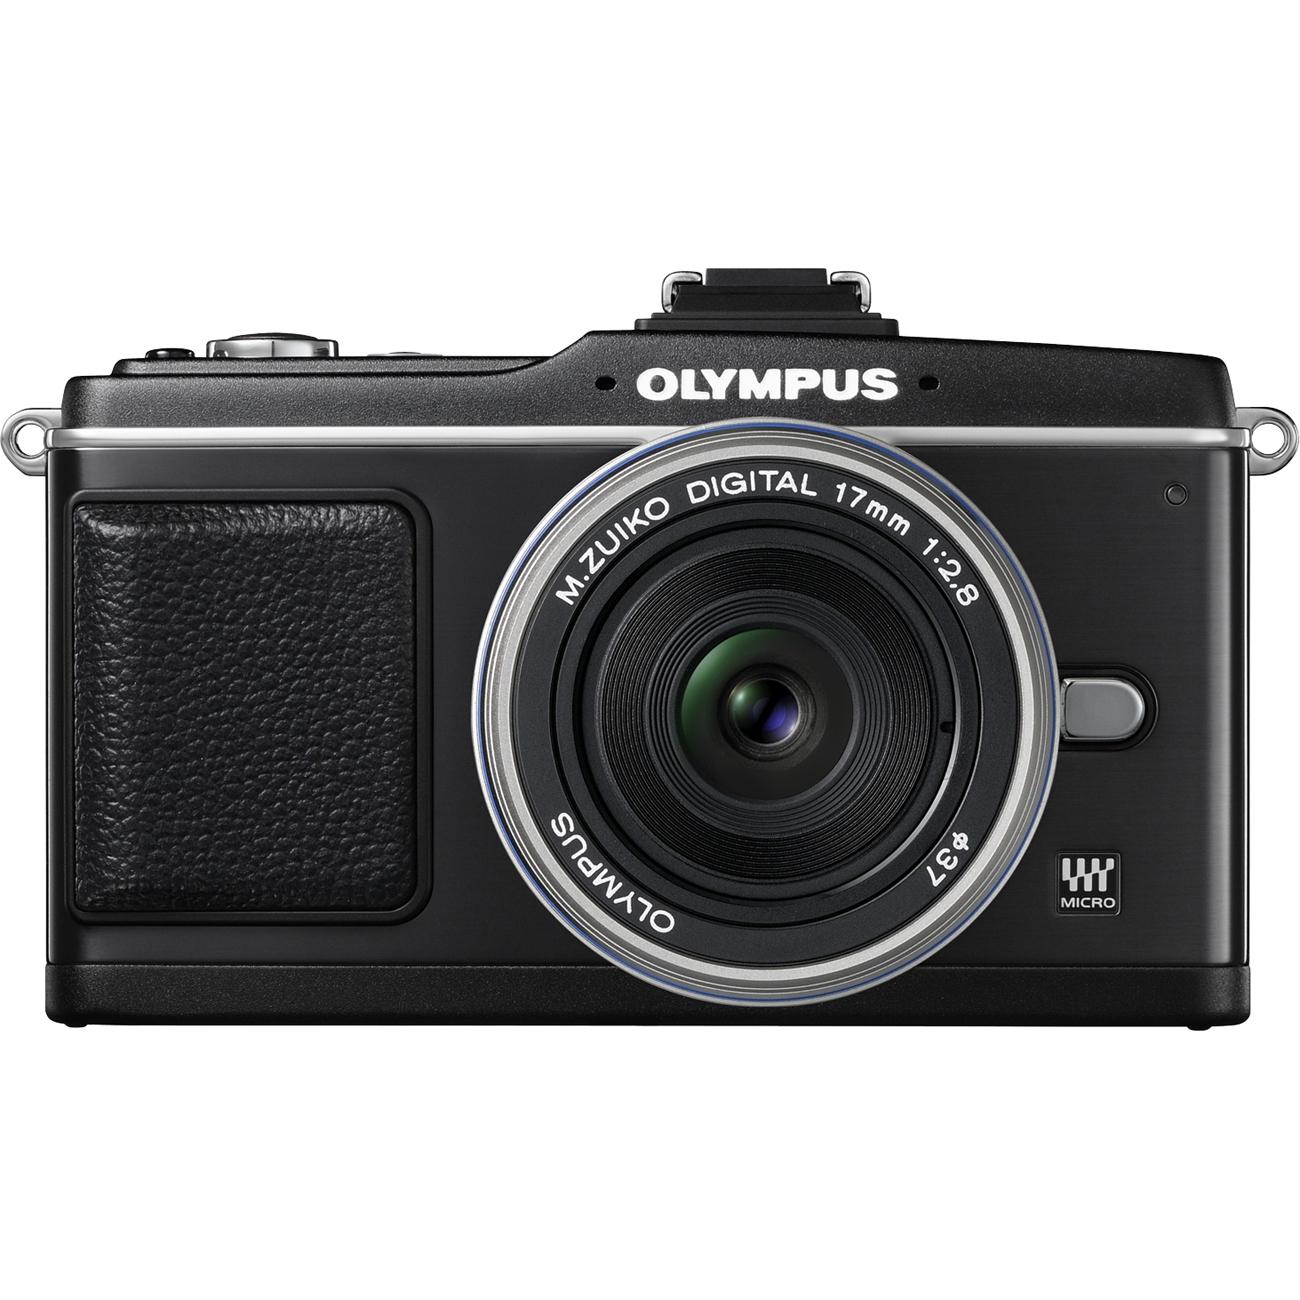 Olympus PEN E-P2 12.3 MP Micro Four Thirds Interchangeabl...